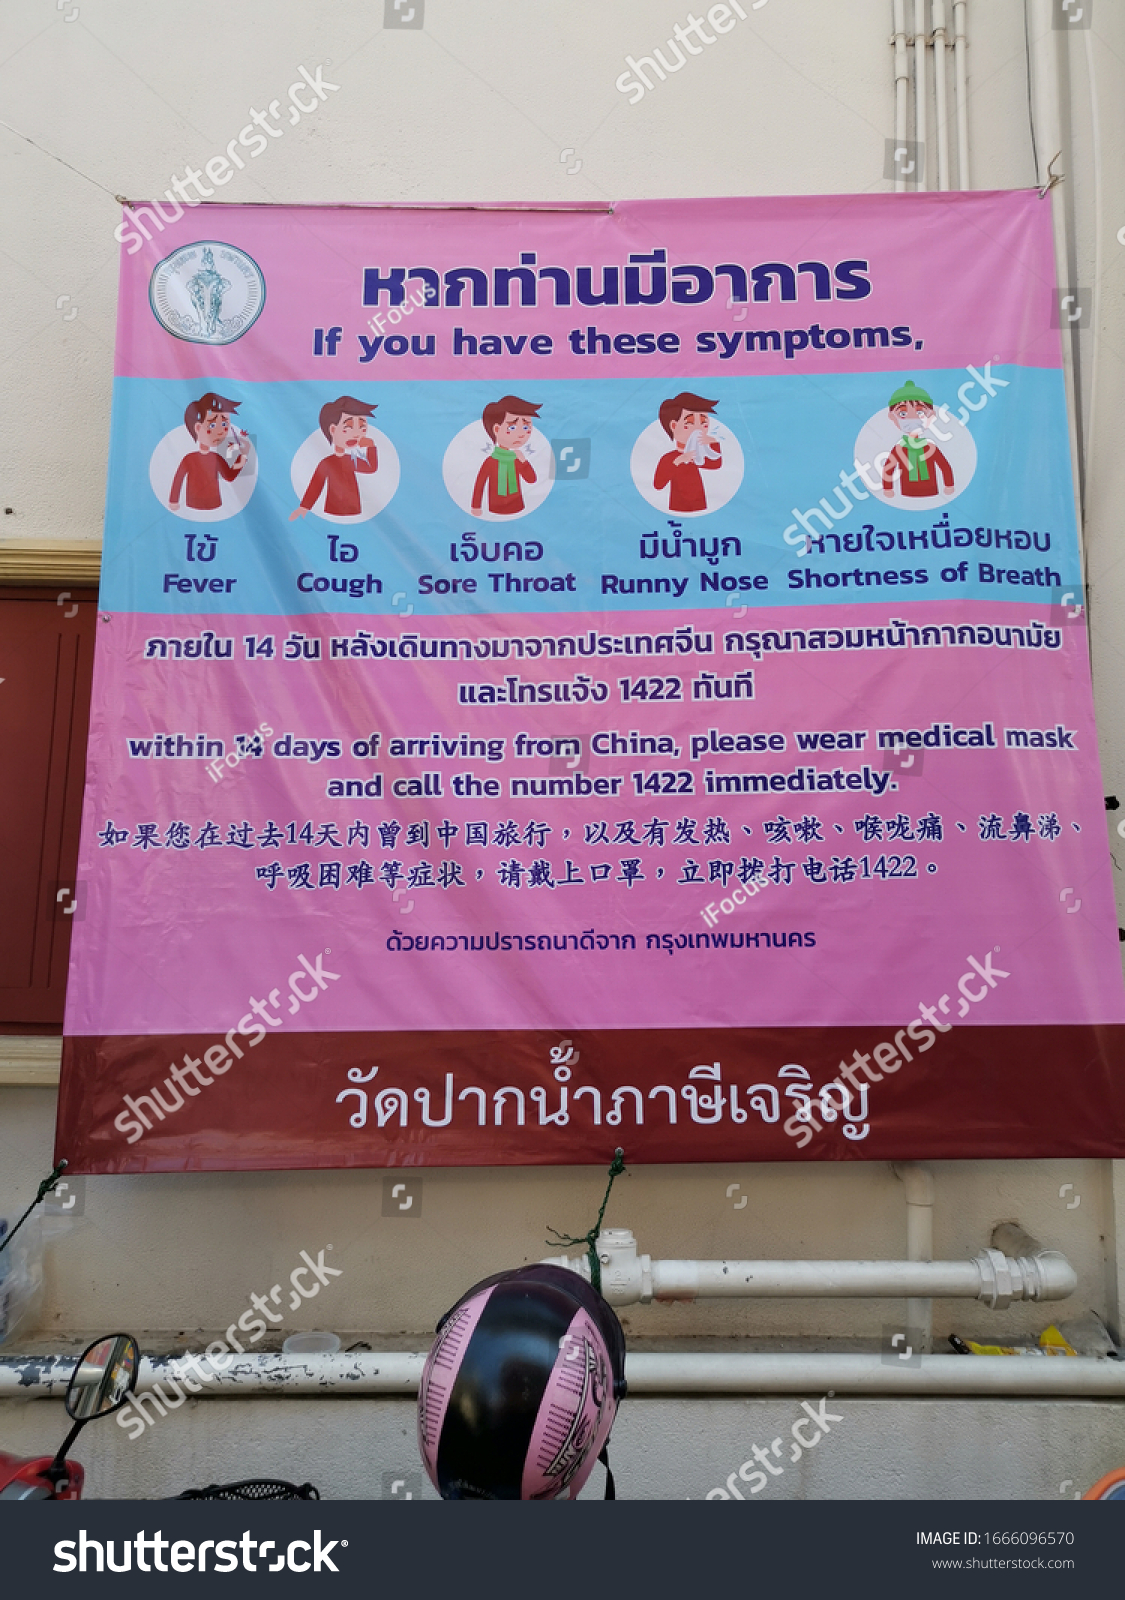 BANGKOK, THAILAND - FEBRUARY 15, 2020 : A large banner informs visitors about corona virus symptoms at Buddhist temple Wat Paknam Phasi Charoen on February 15, 2020 in Thai capital Bangkok